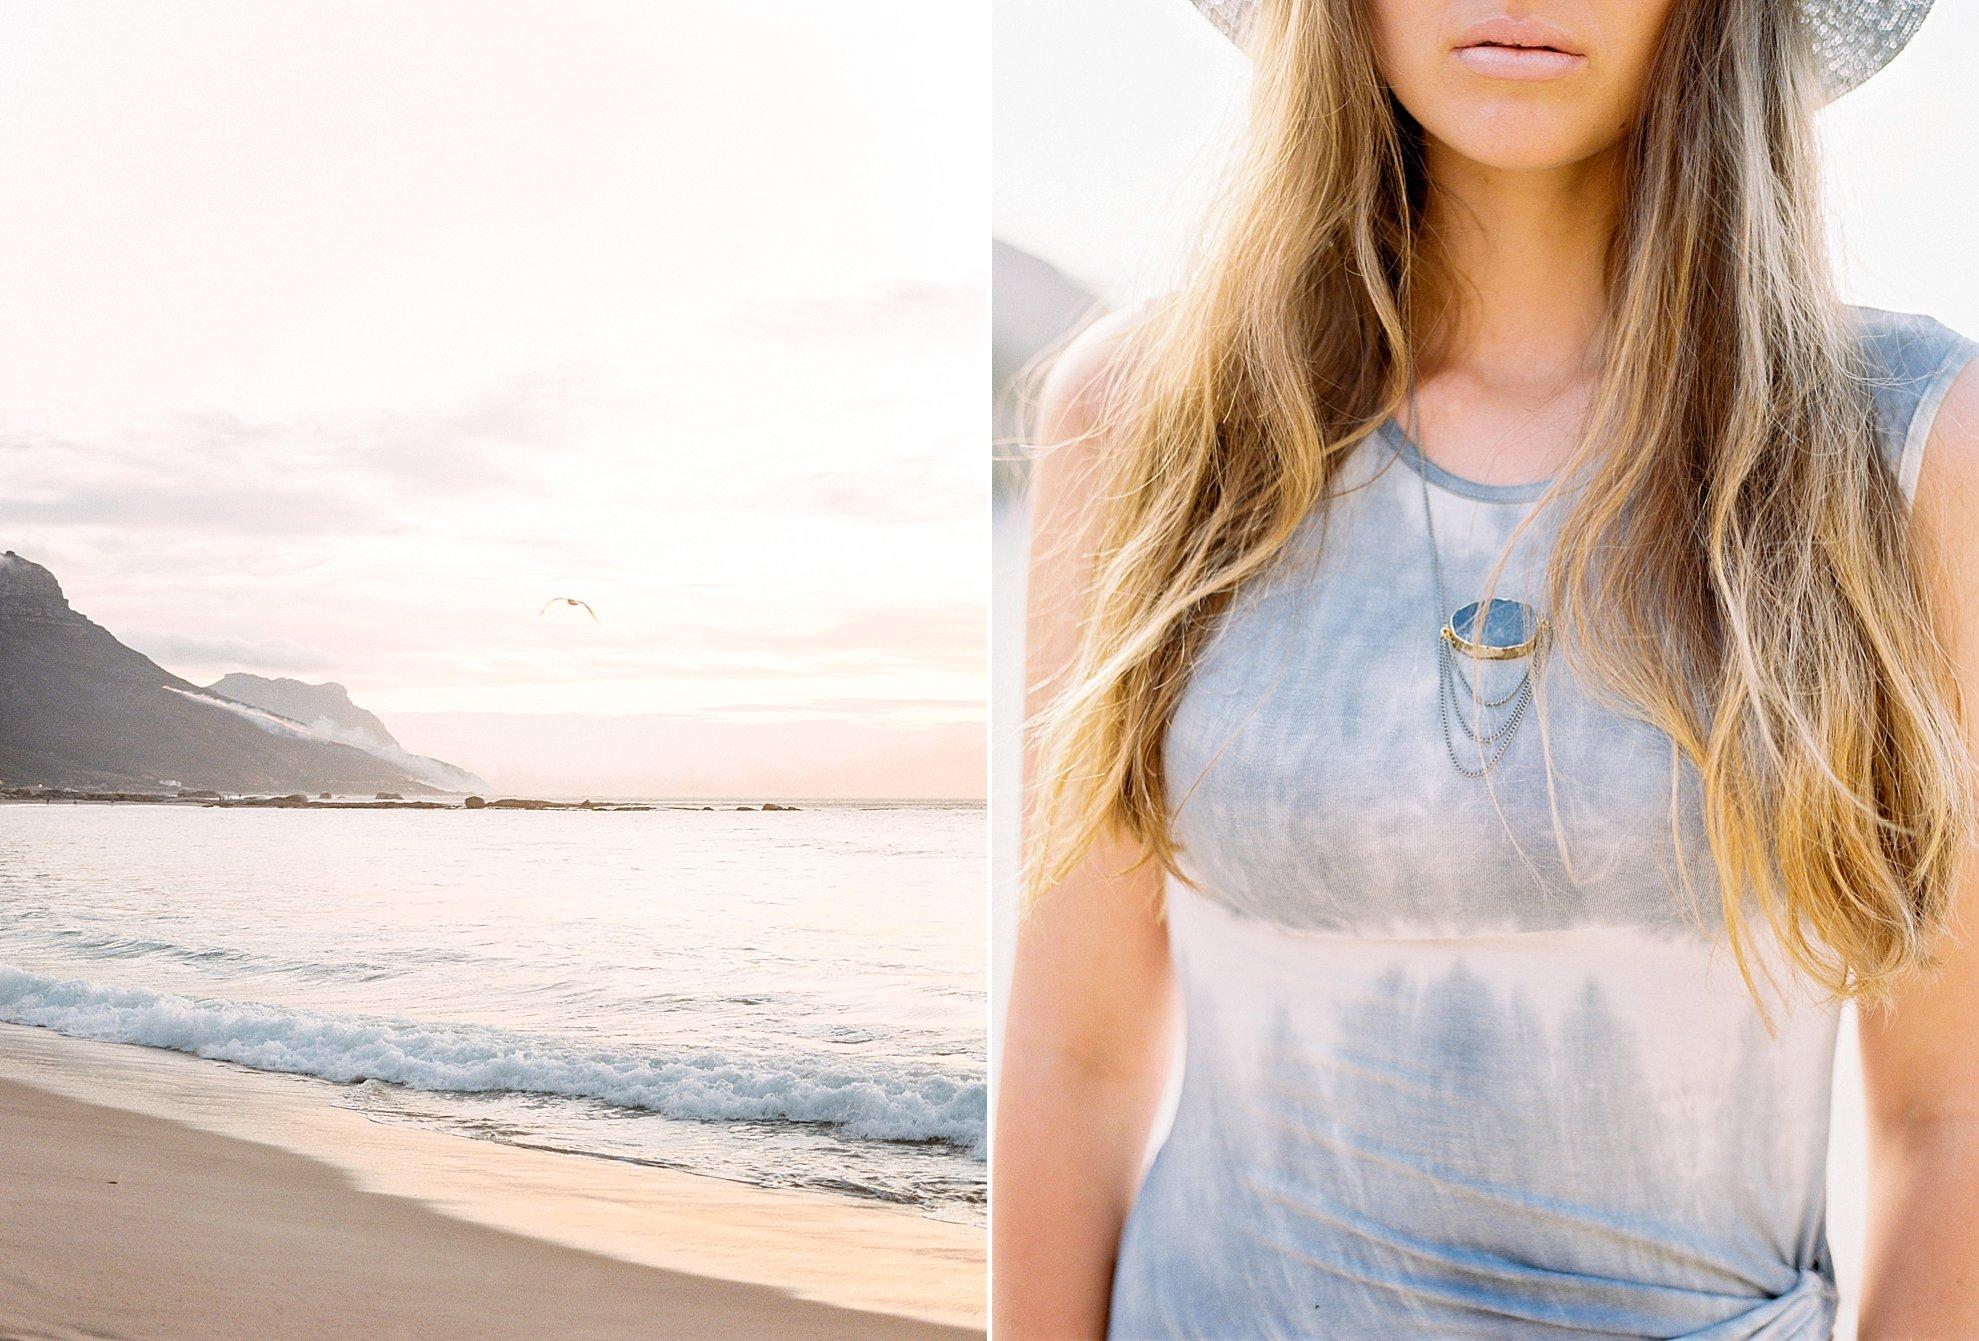 Amanda-Drost-photography-editorial-South-Africa-fashion-fotografie-mode-Zuid-Afrika_0016.jpg